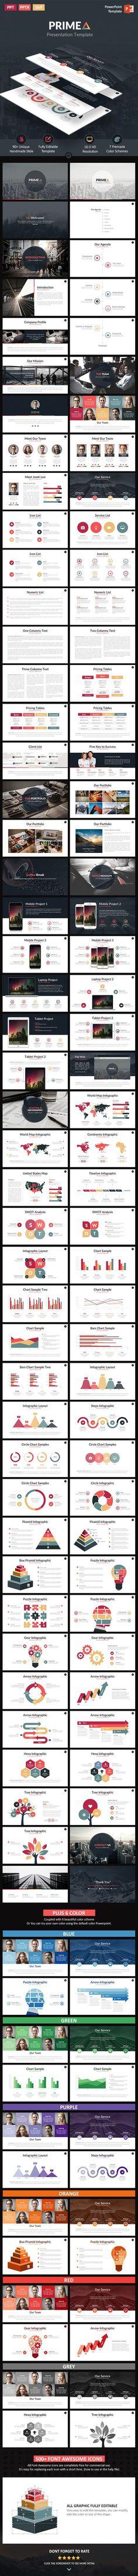 "Primea - PowerPoint Presentation Template <a class=""pintag"" href=""/explore/design"" title=""#design explore Pinterest"">#design</a> Download: <a href=""http://graphicriver.net/item/primea-powerpoint-presentation-template/11828976?ref=ksioks"" rel=""nofollow"" target=""_blank"">graphicriver.net/...</a>"